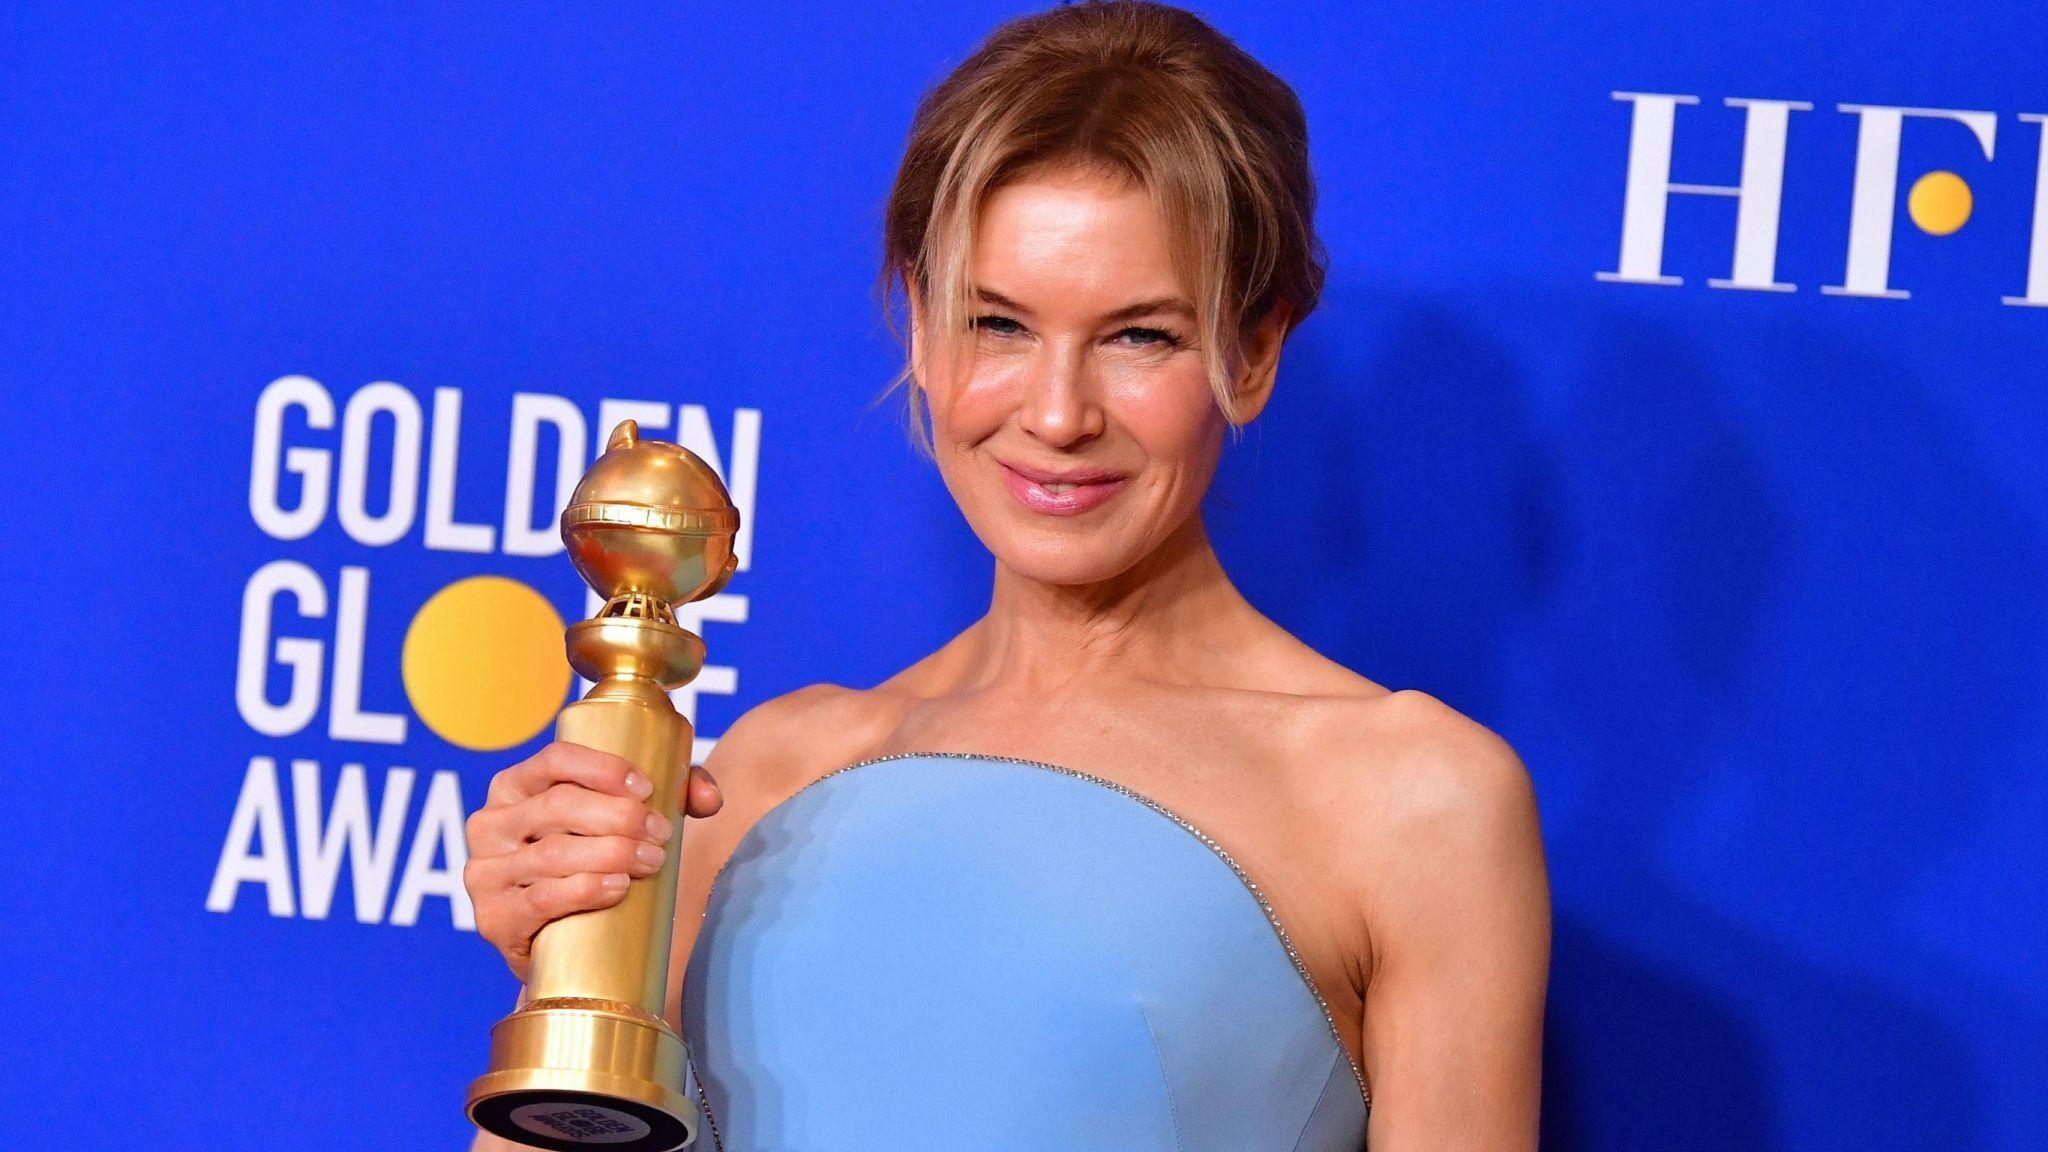 Golden Globes best actress (drama) Renee Zellweger